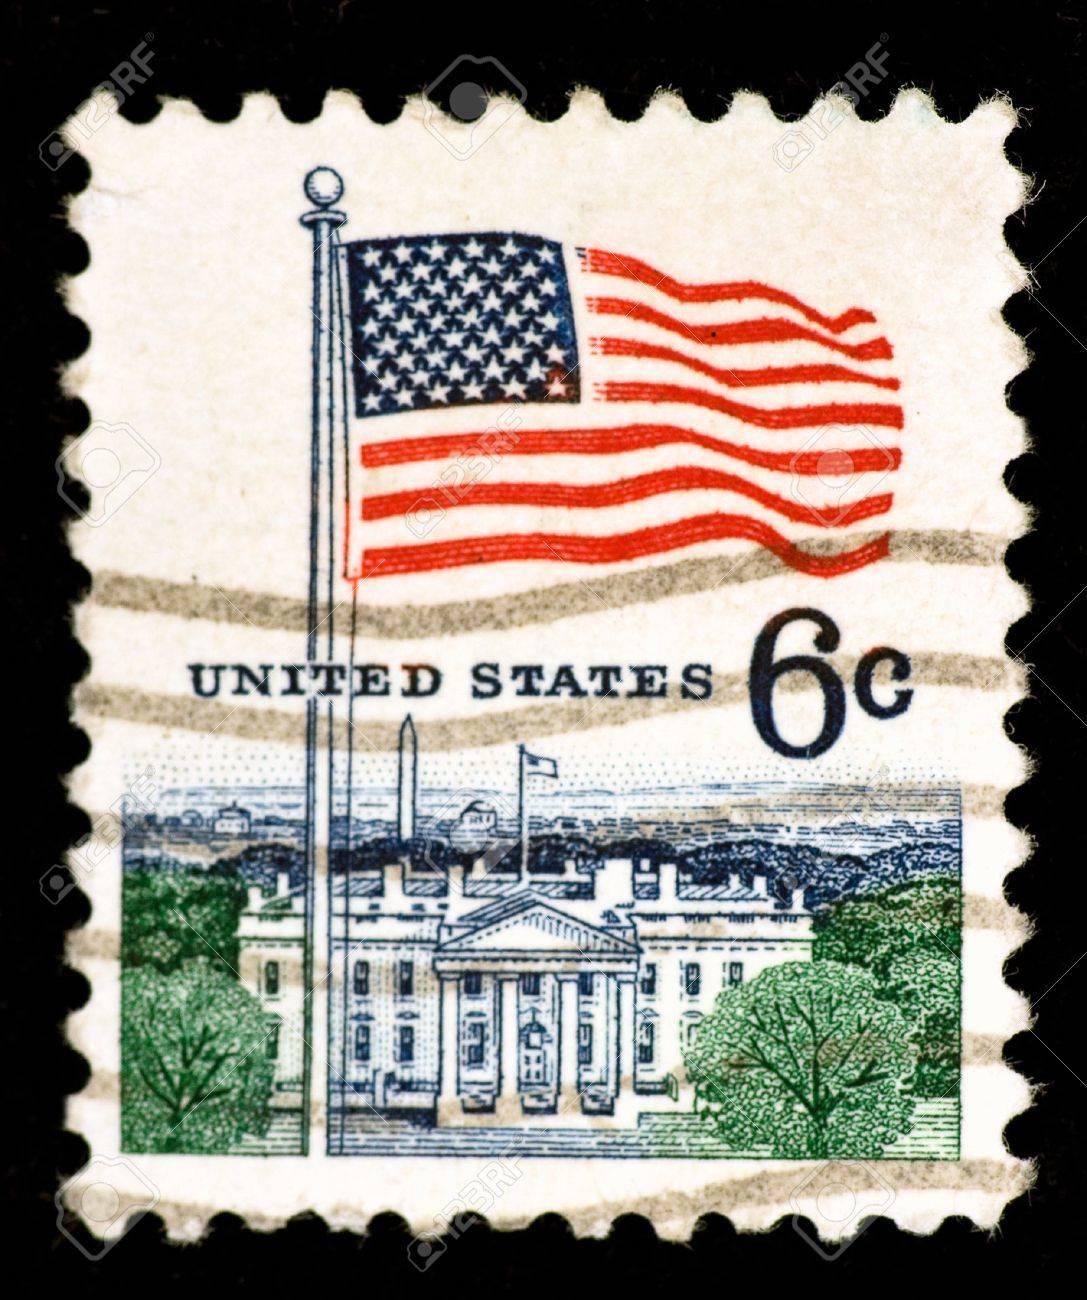 Vintage US postage stamp Stock Photo - 6189022